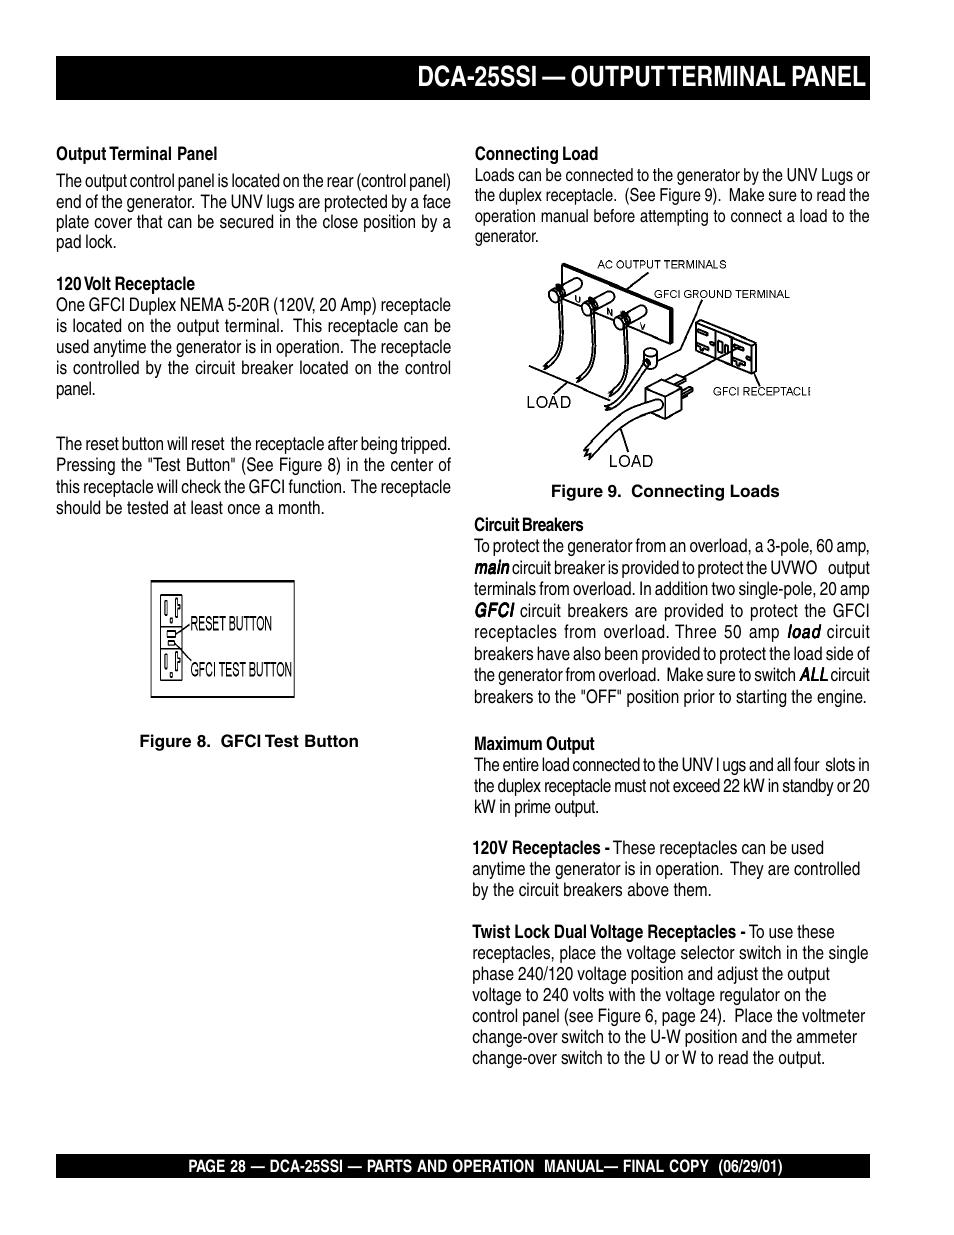 Dca-25ssi — output terminal panel | Multiquip MQ Power Whisperwatt ...